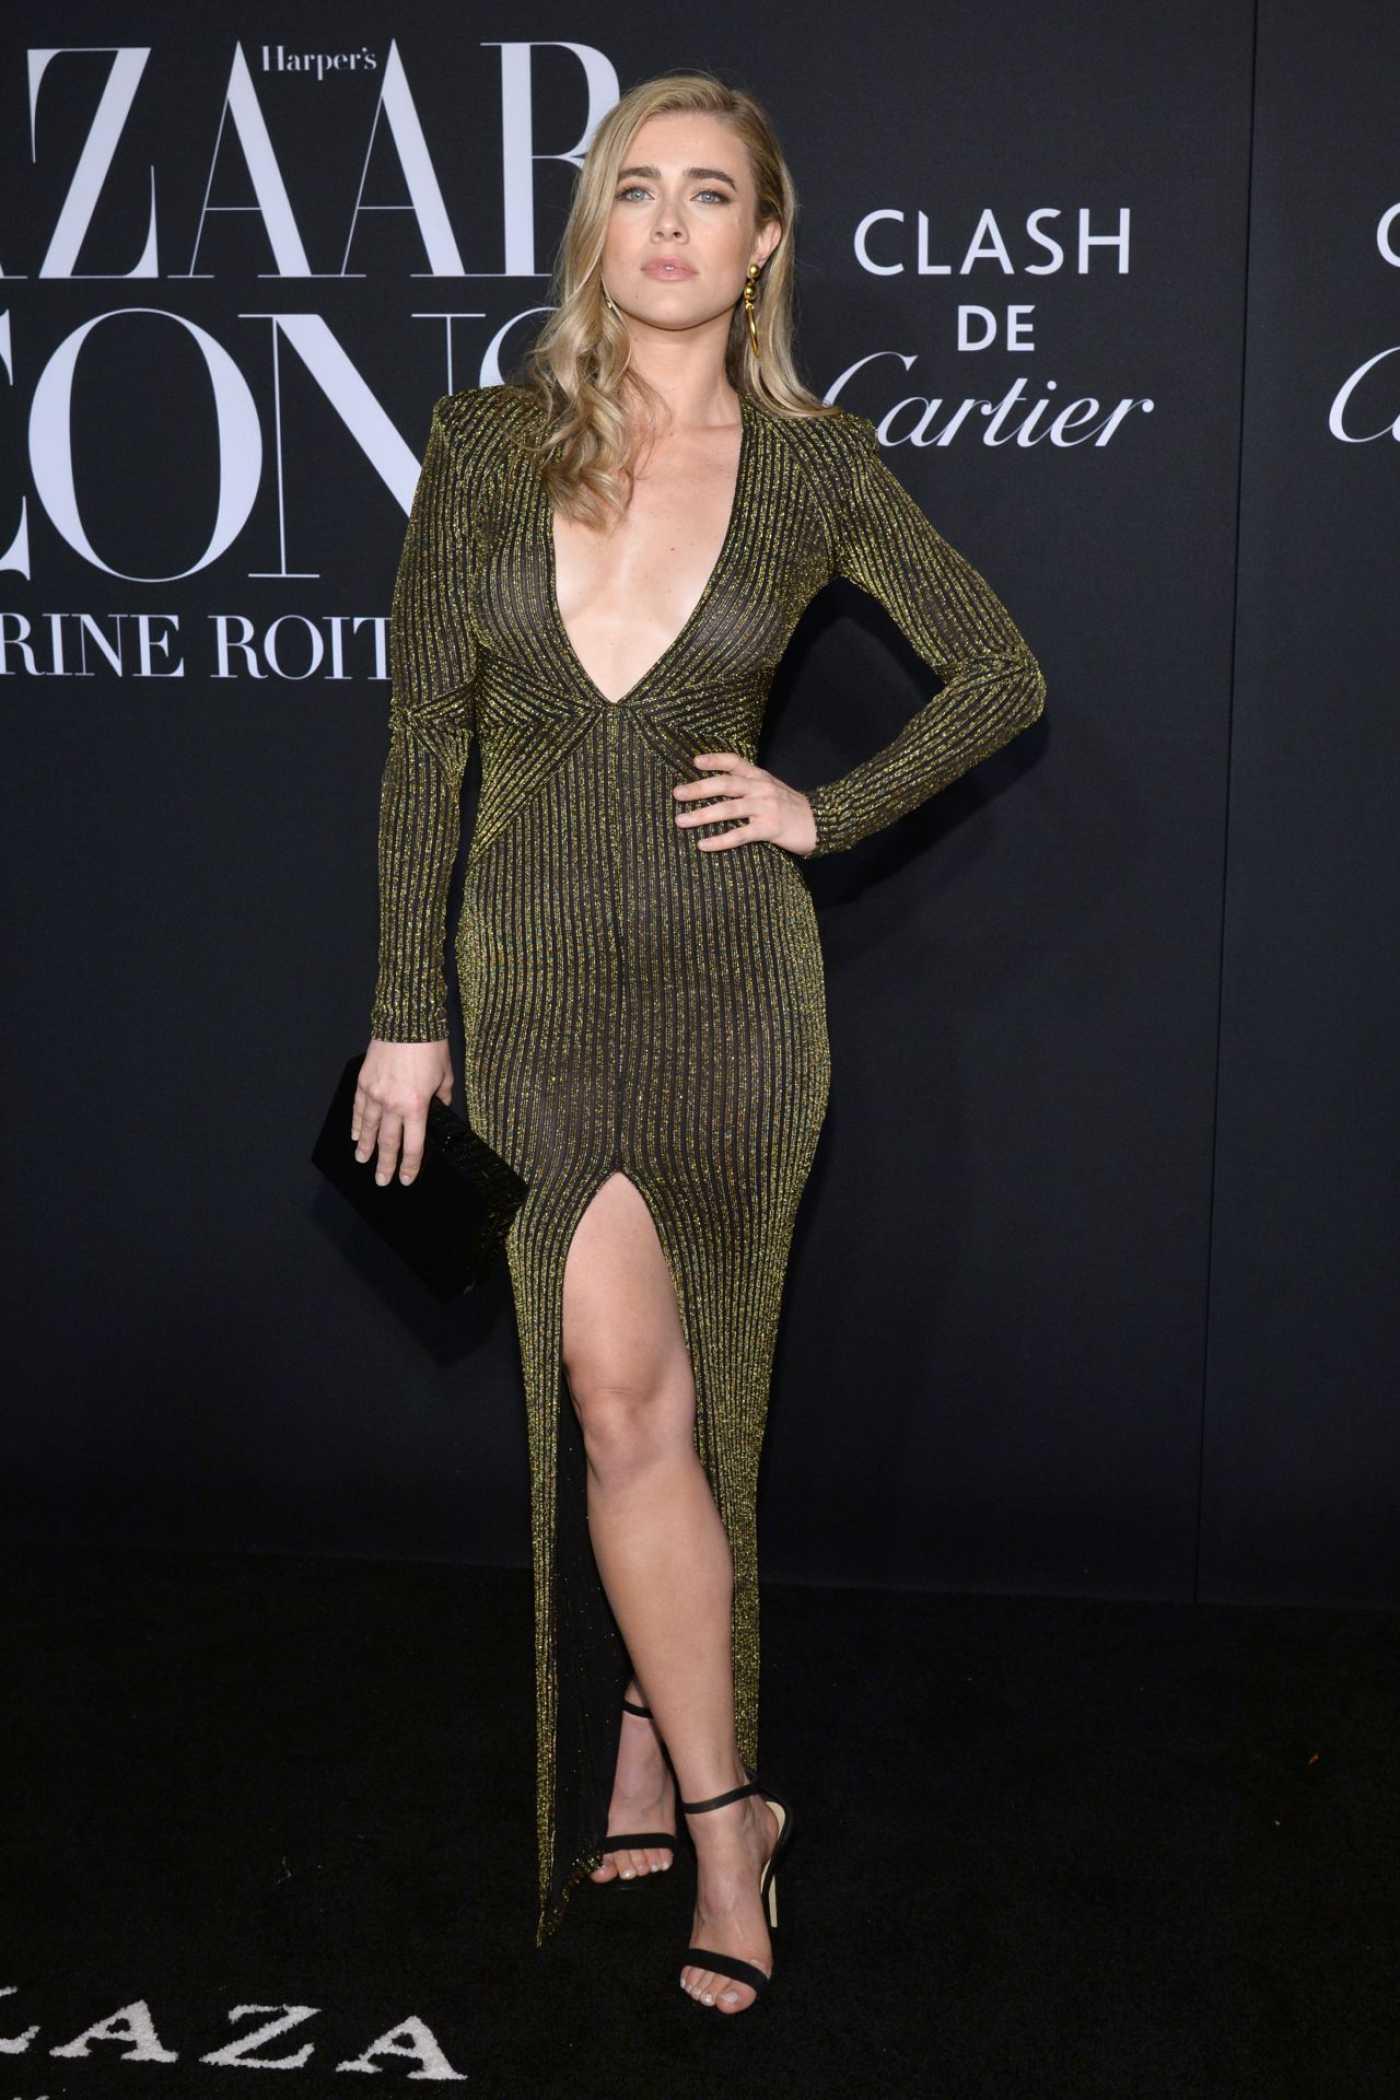 Melissa Roxburgh Attends Harper's Bazaar Icons Party in New York 09/06/2019